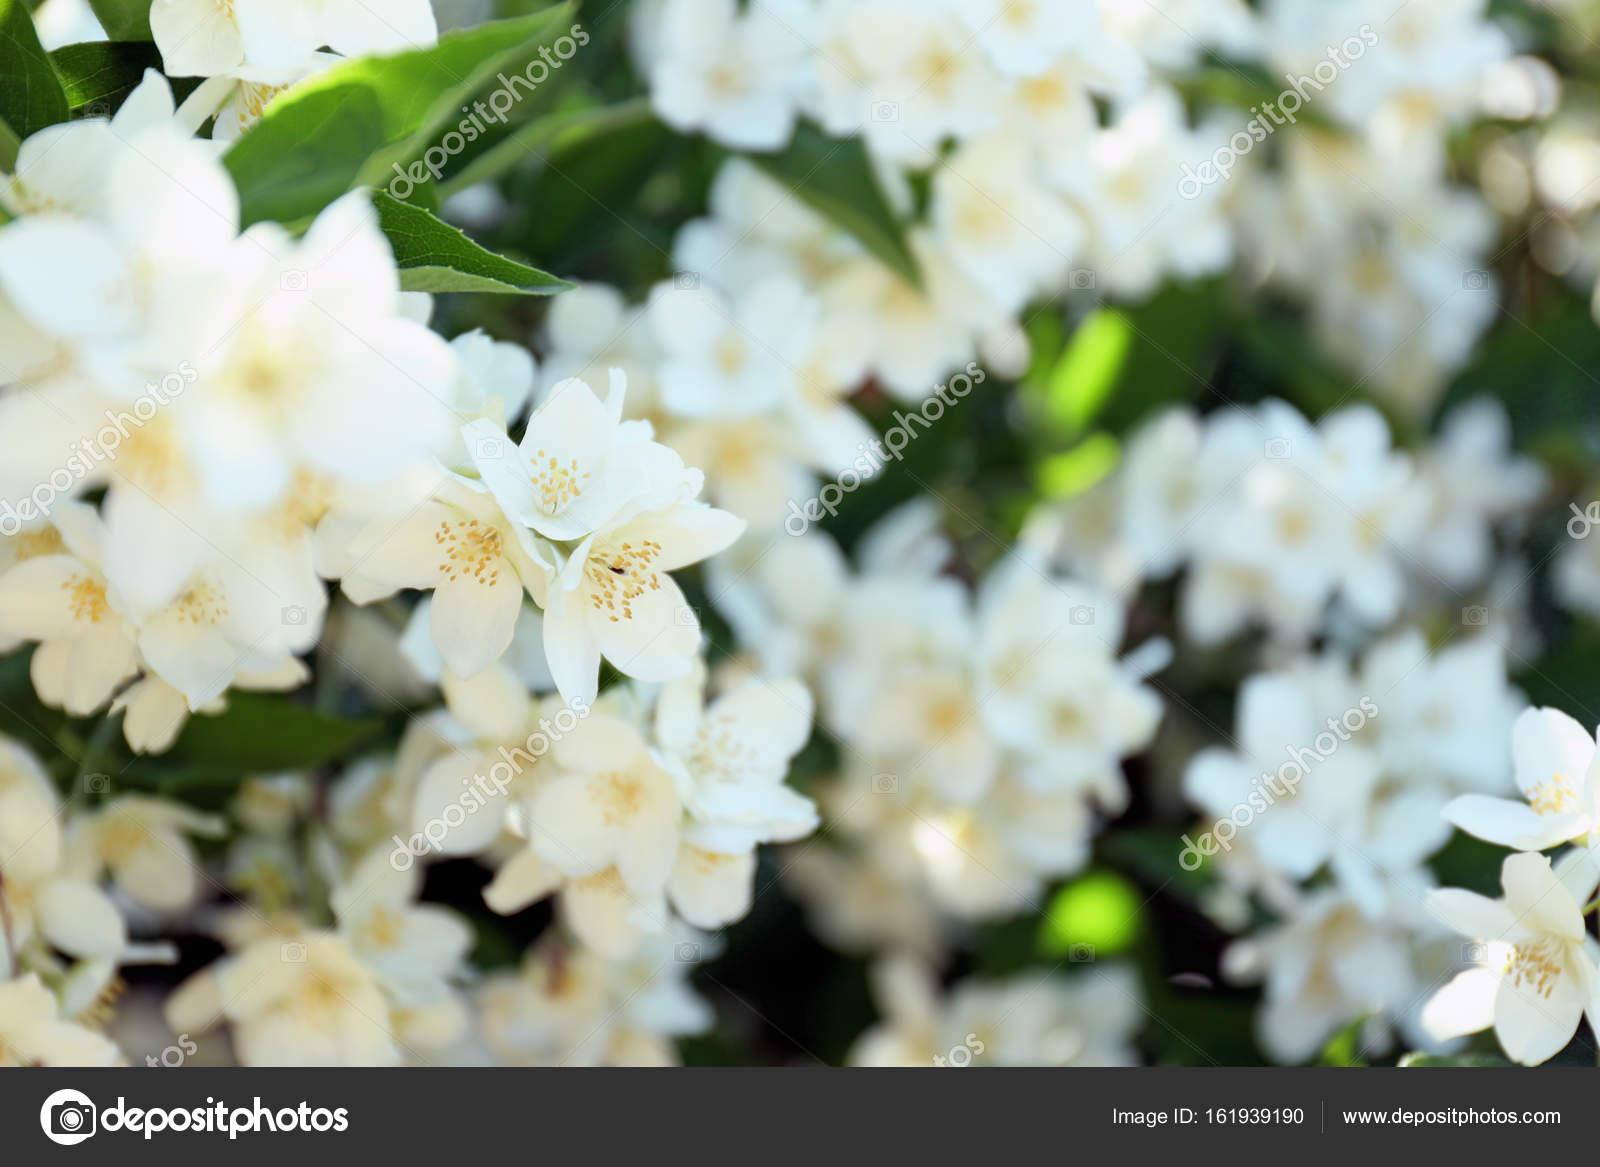 Beautiful jasmine flowers stock photo belchonock 161939190 beautiful jasmine flowers stock photo izmirmasajfo